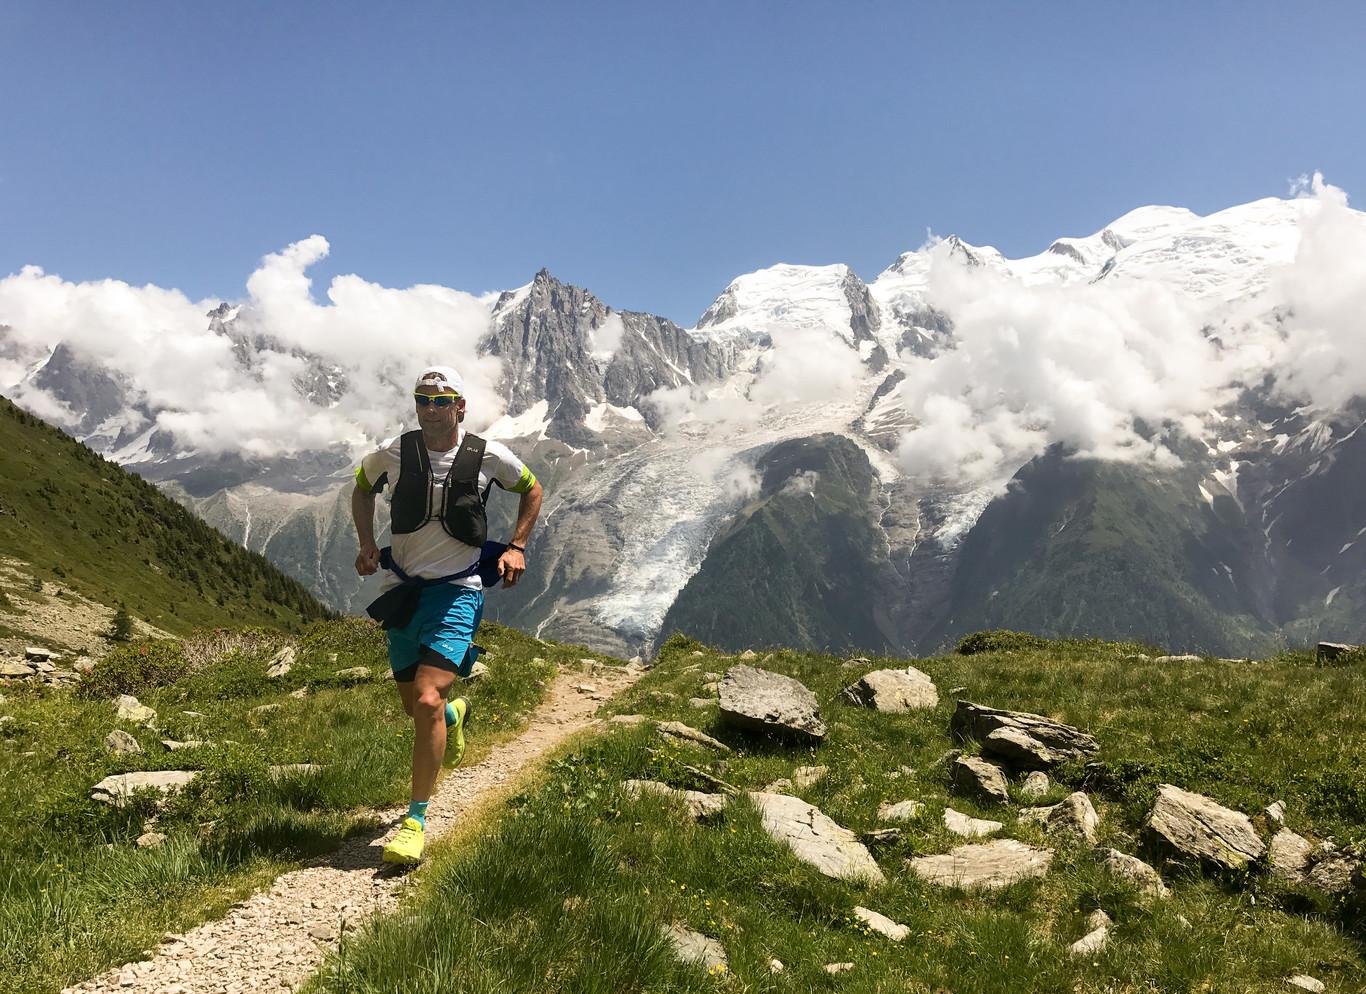 entrenamiento de gimnasio para corredores de montaña